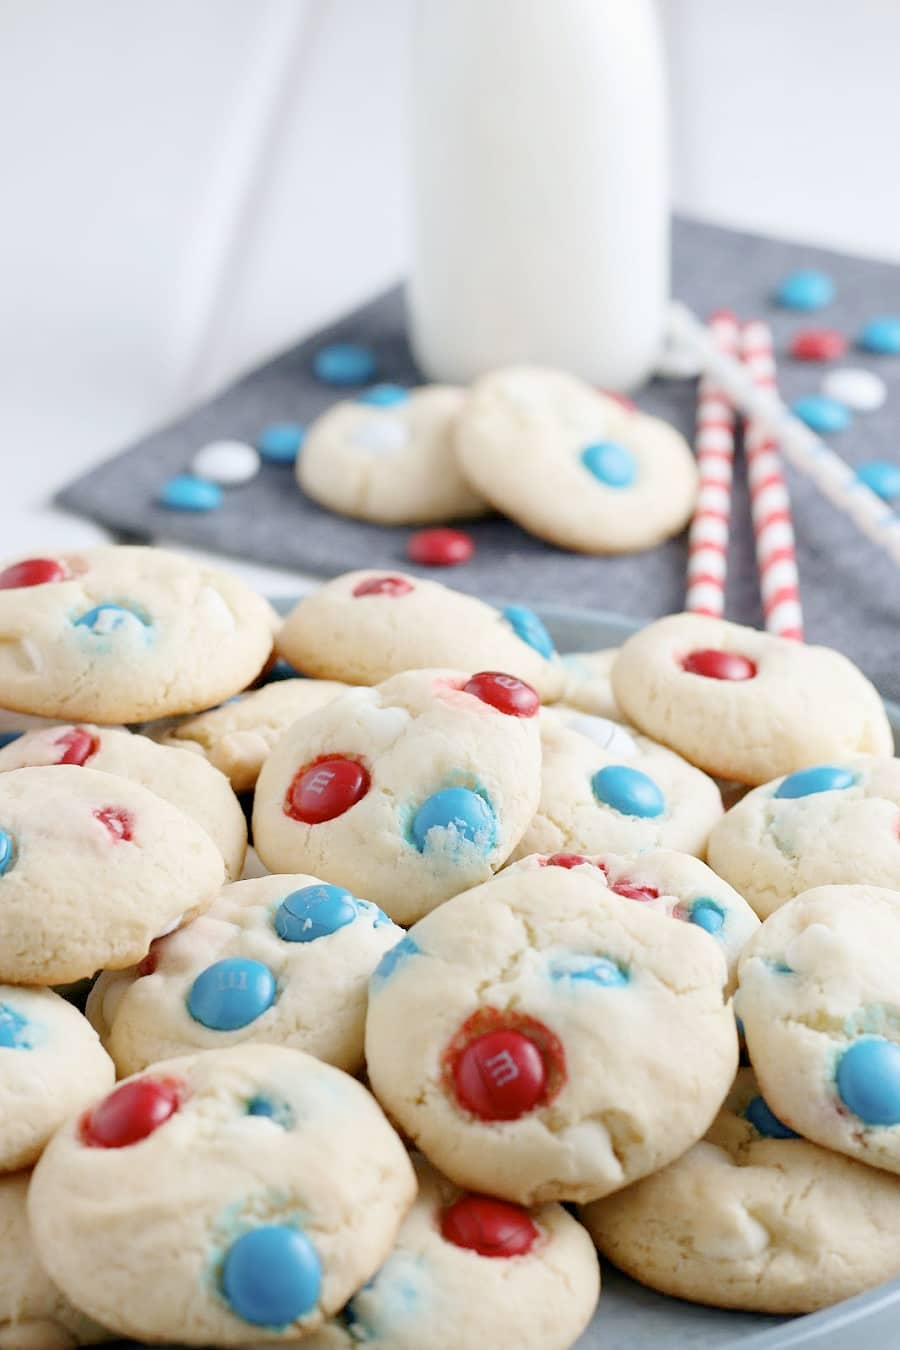 Patriotic Cake Mix Cookies up close